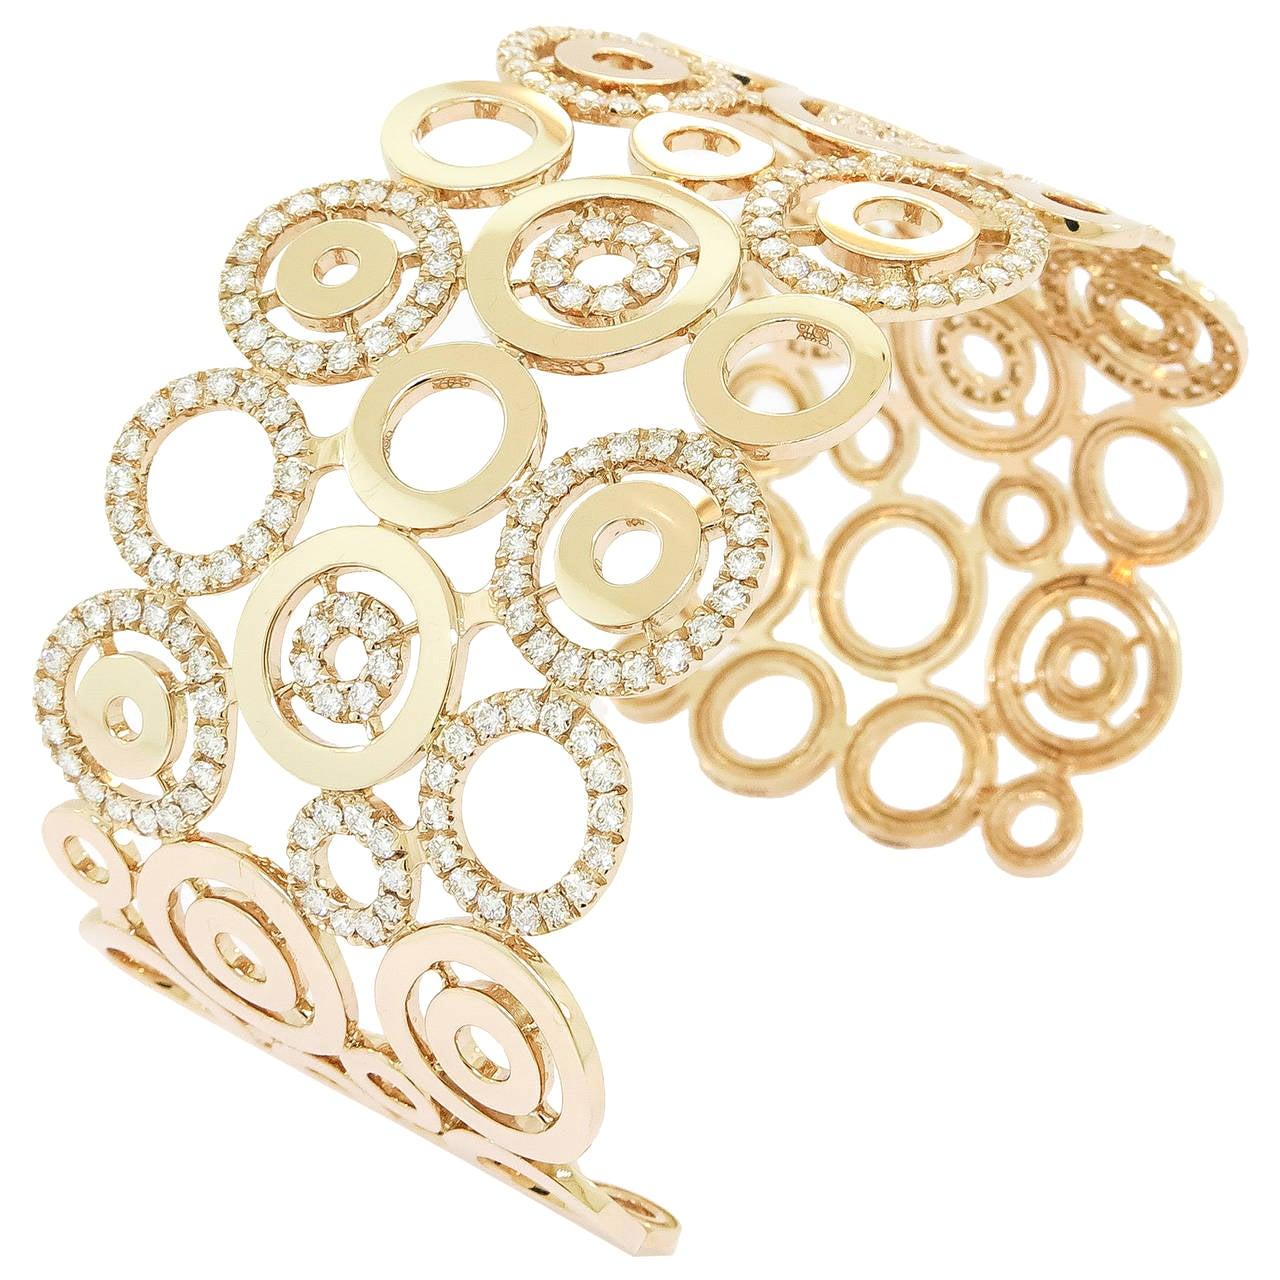 Circles Design Diamond 18 Karat Rose Gold Wide Open Cuff Bracelet